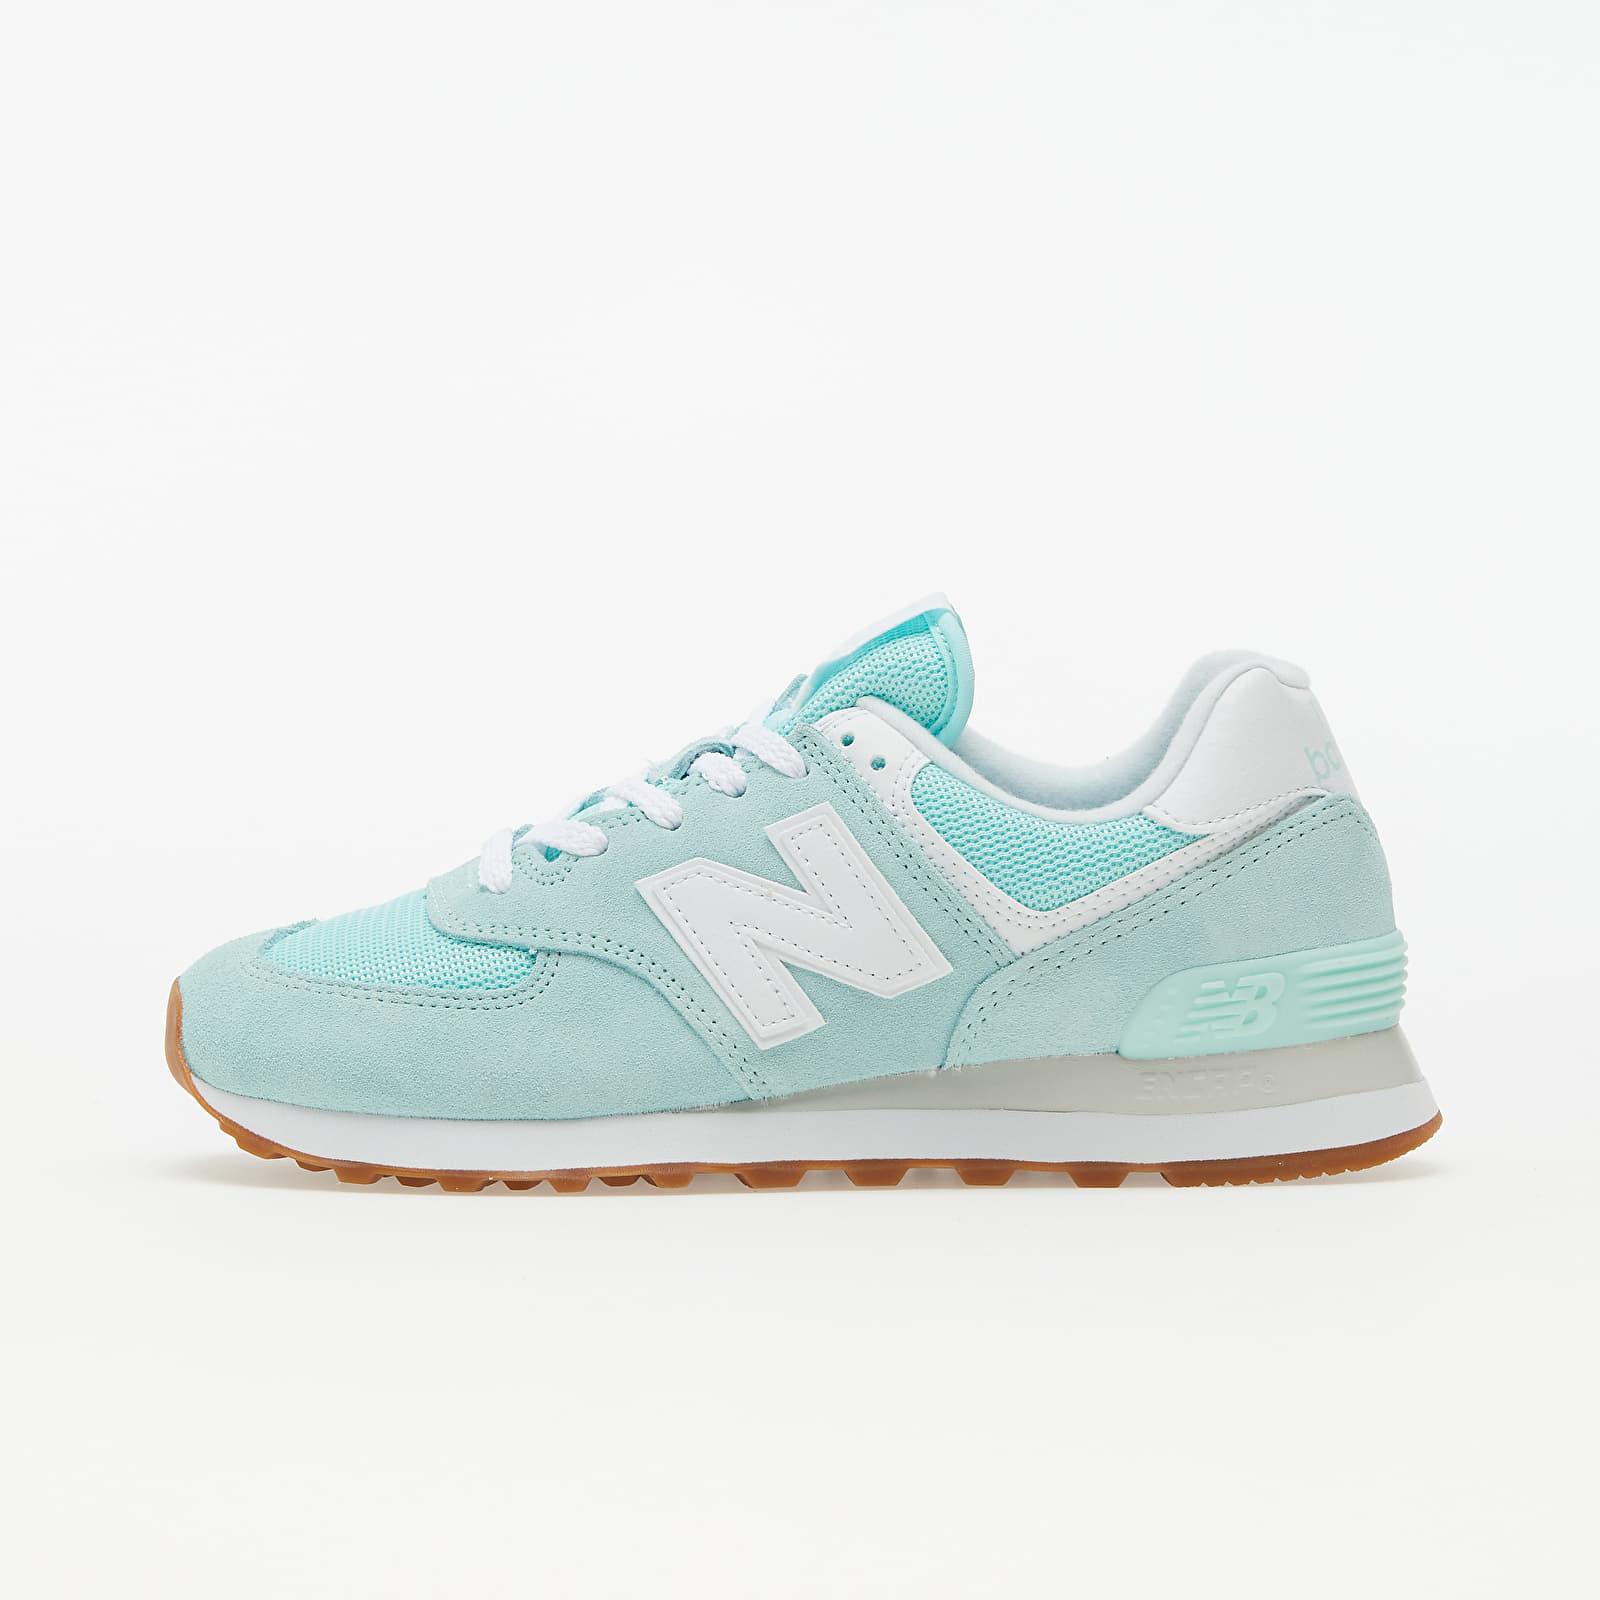 New Balance 574 Turquoise | Footshop